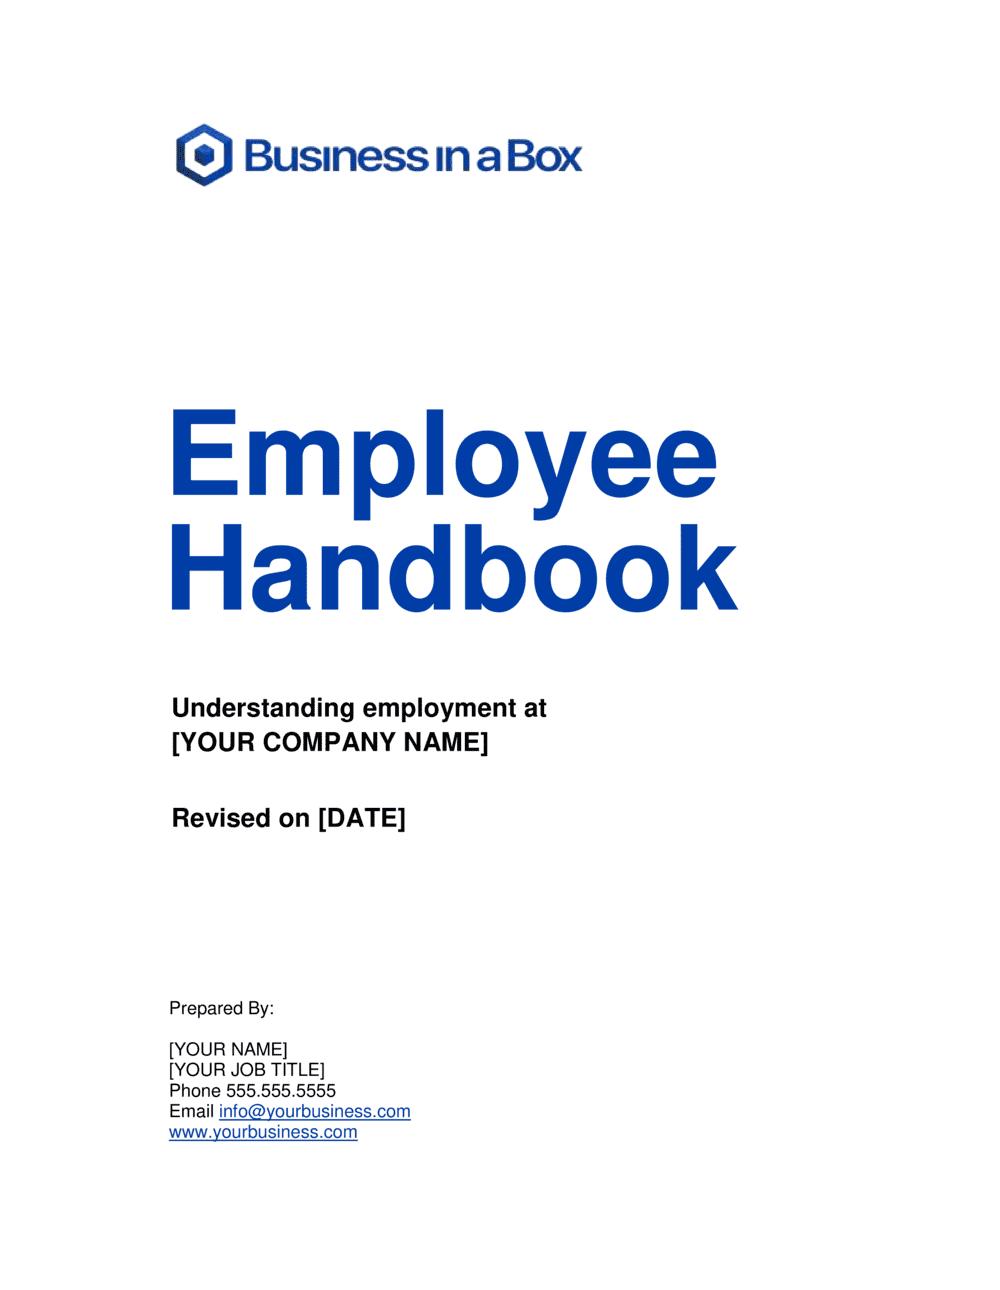 Business-in-a-Box's Employee Handbook Template